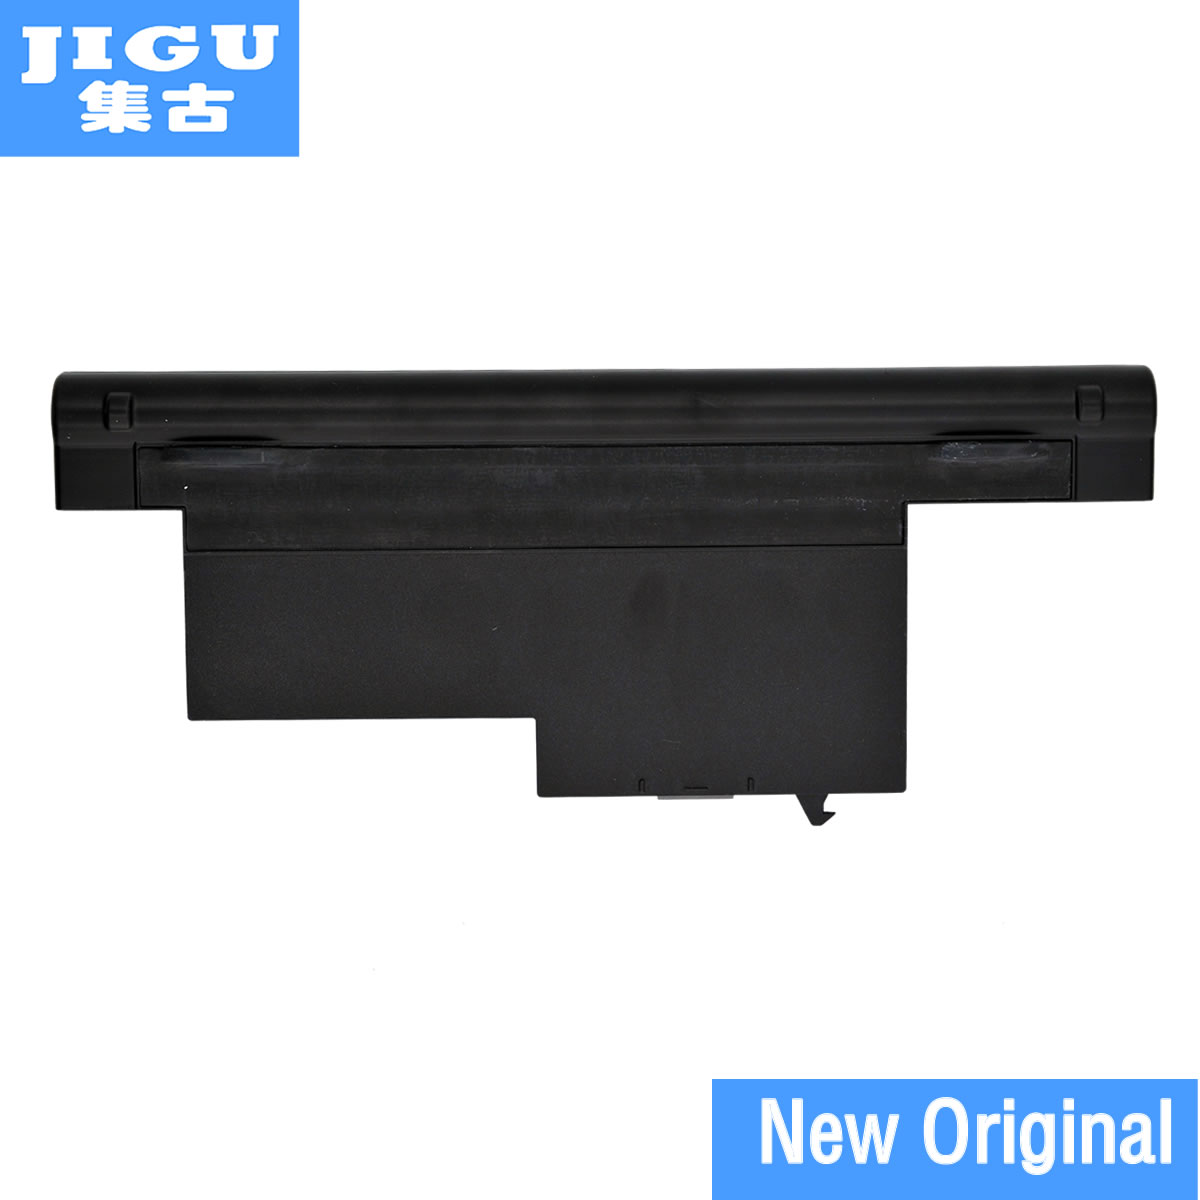 JIGU 40Y8314 40Y8318 42T5209 42T5204 42T5206 42T5208 Original laptop Battery For Lenovo for ThinkPad X60T X61T X60 X61 Tablet PC k1 portable 3w bluetooth v2 1 speaker w mic mini usb tf fm green black multicolored